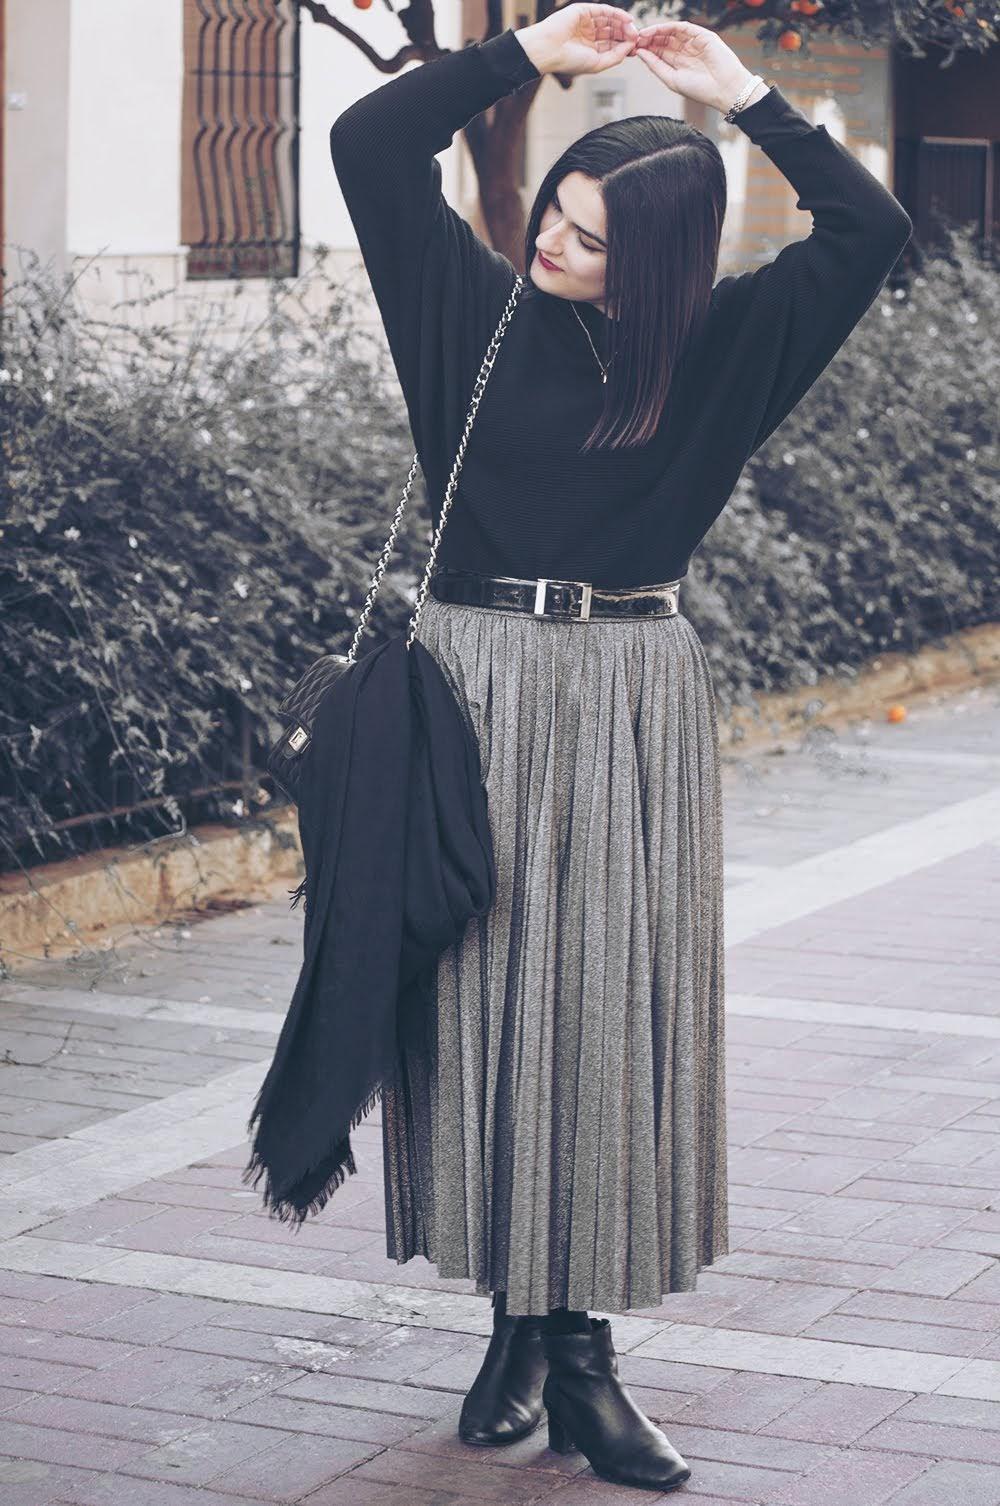 somethingfashion valenciablogger spain collaboration fashionblogger shein amanda ramón longdresses outfit idea ootd_0087